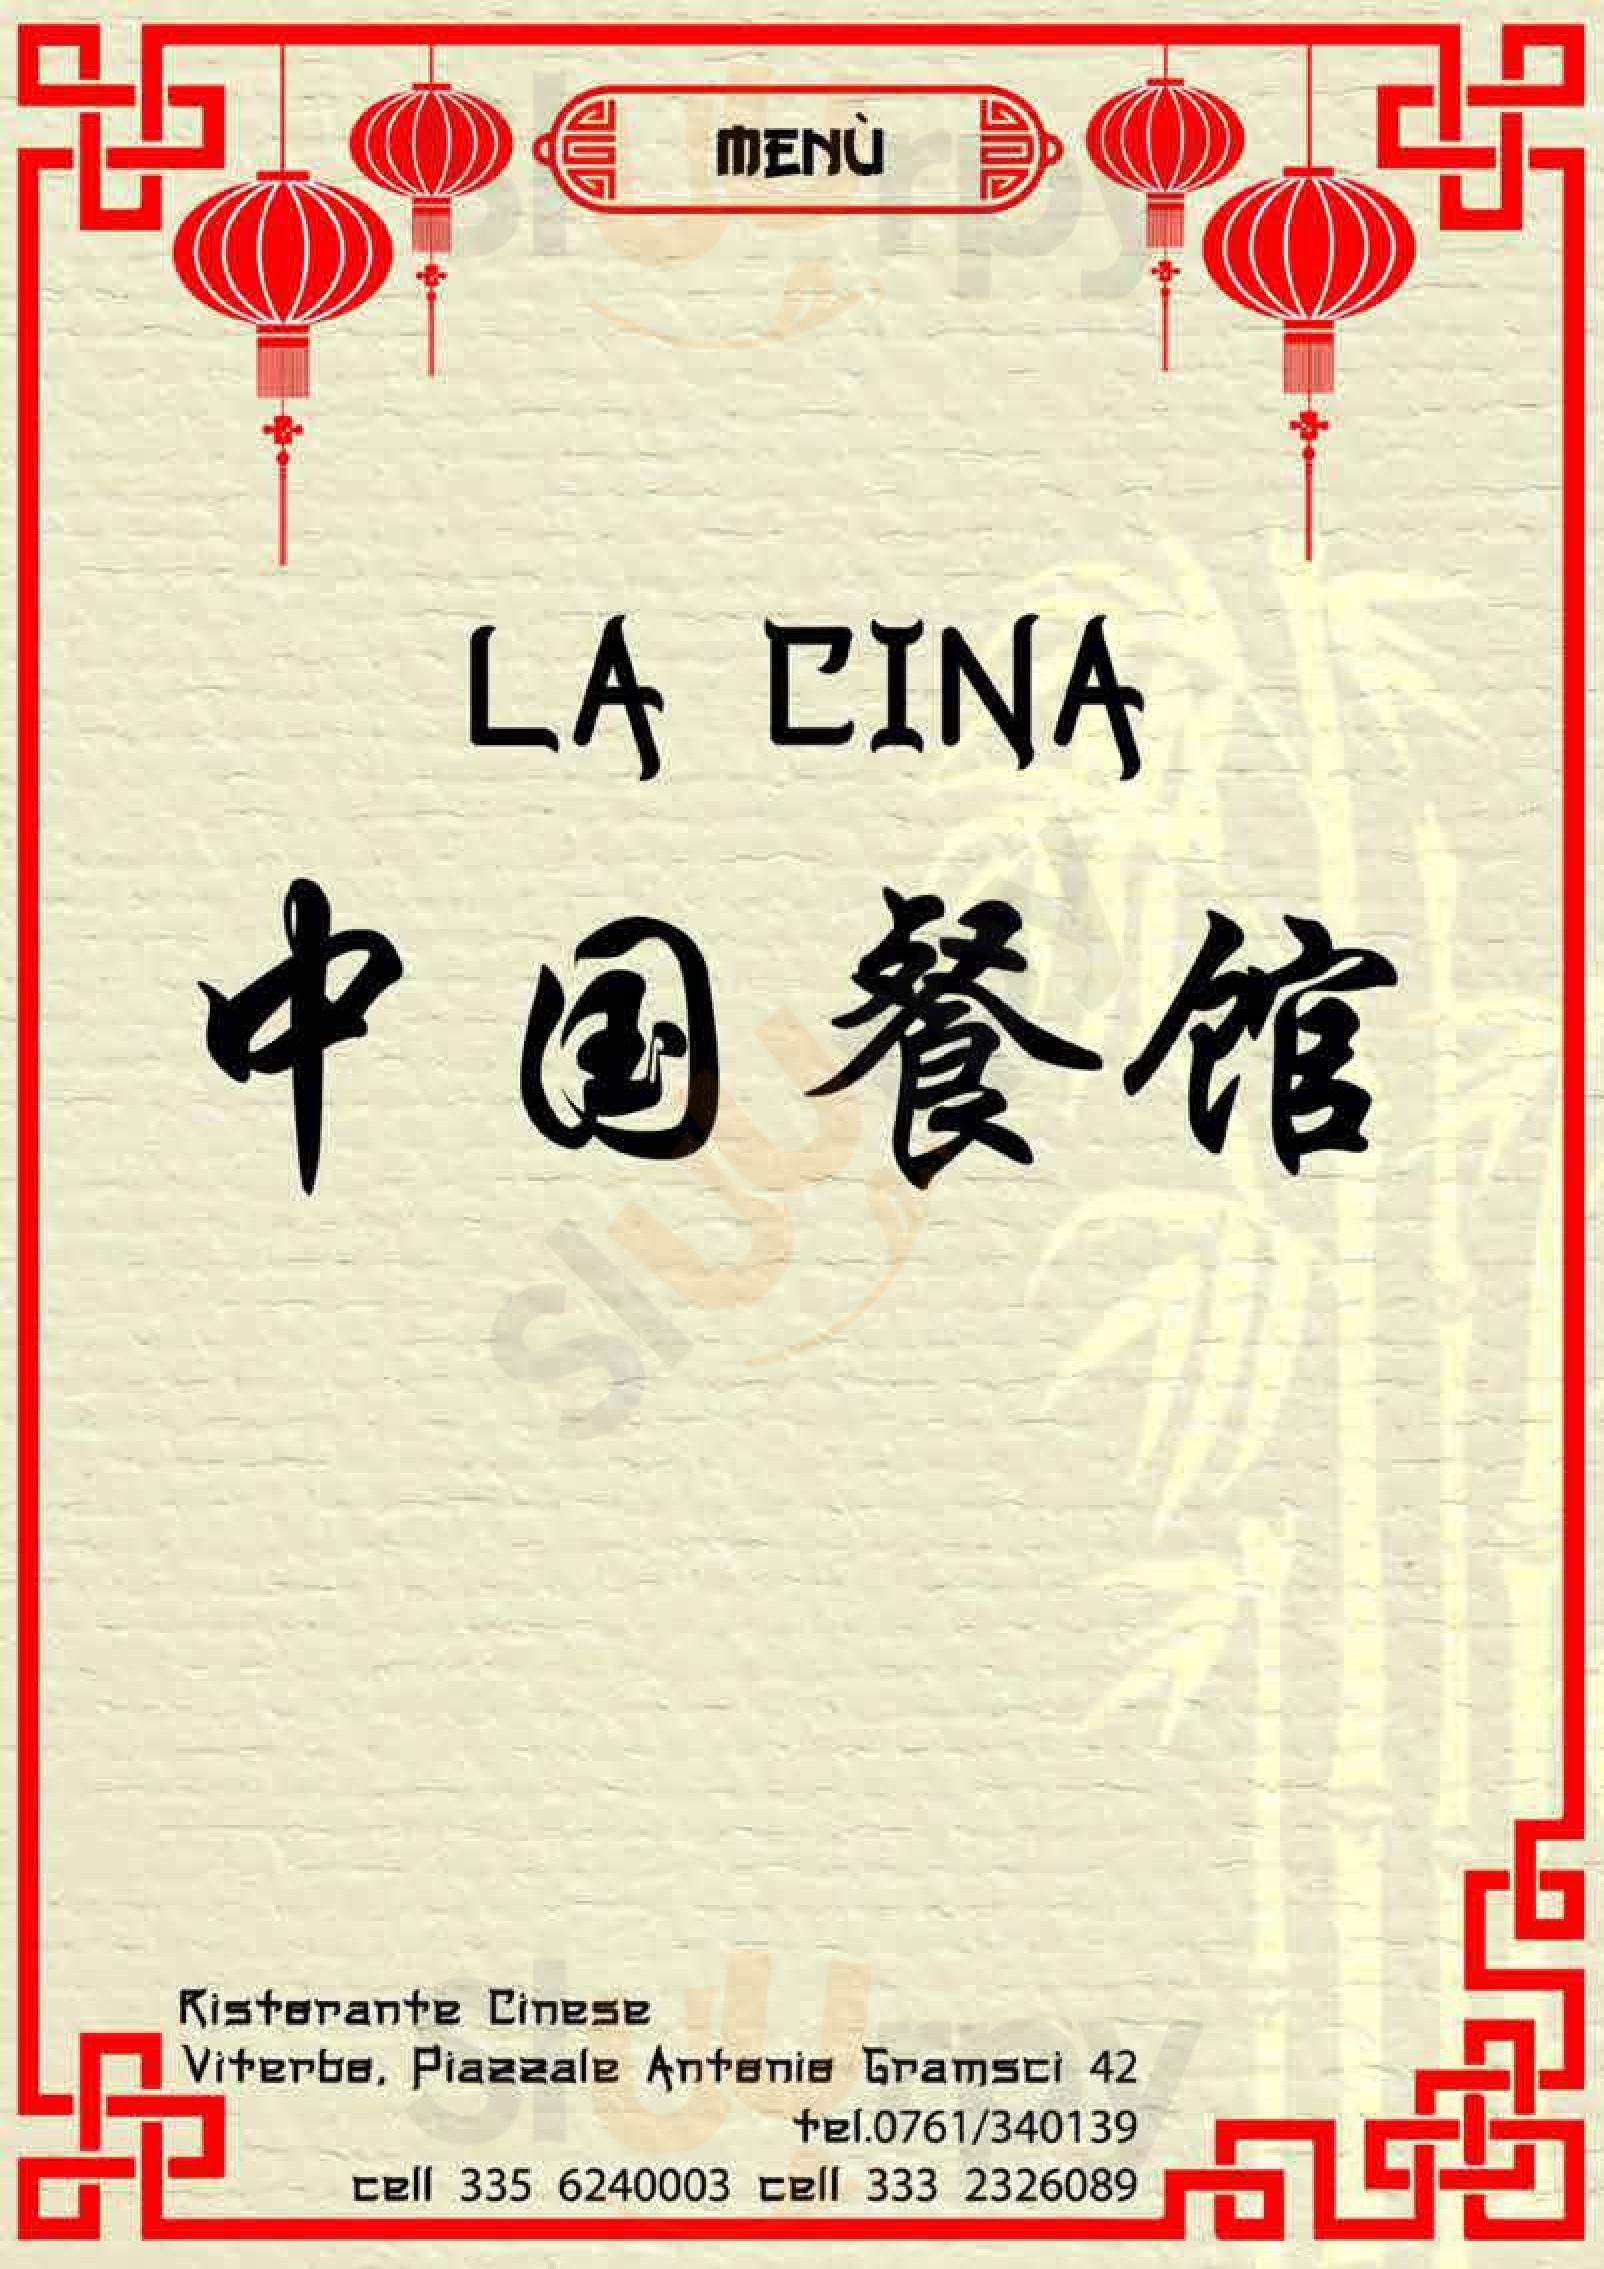 La Cina Viterbo menù 1 pagina